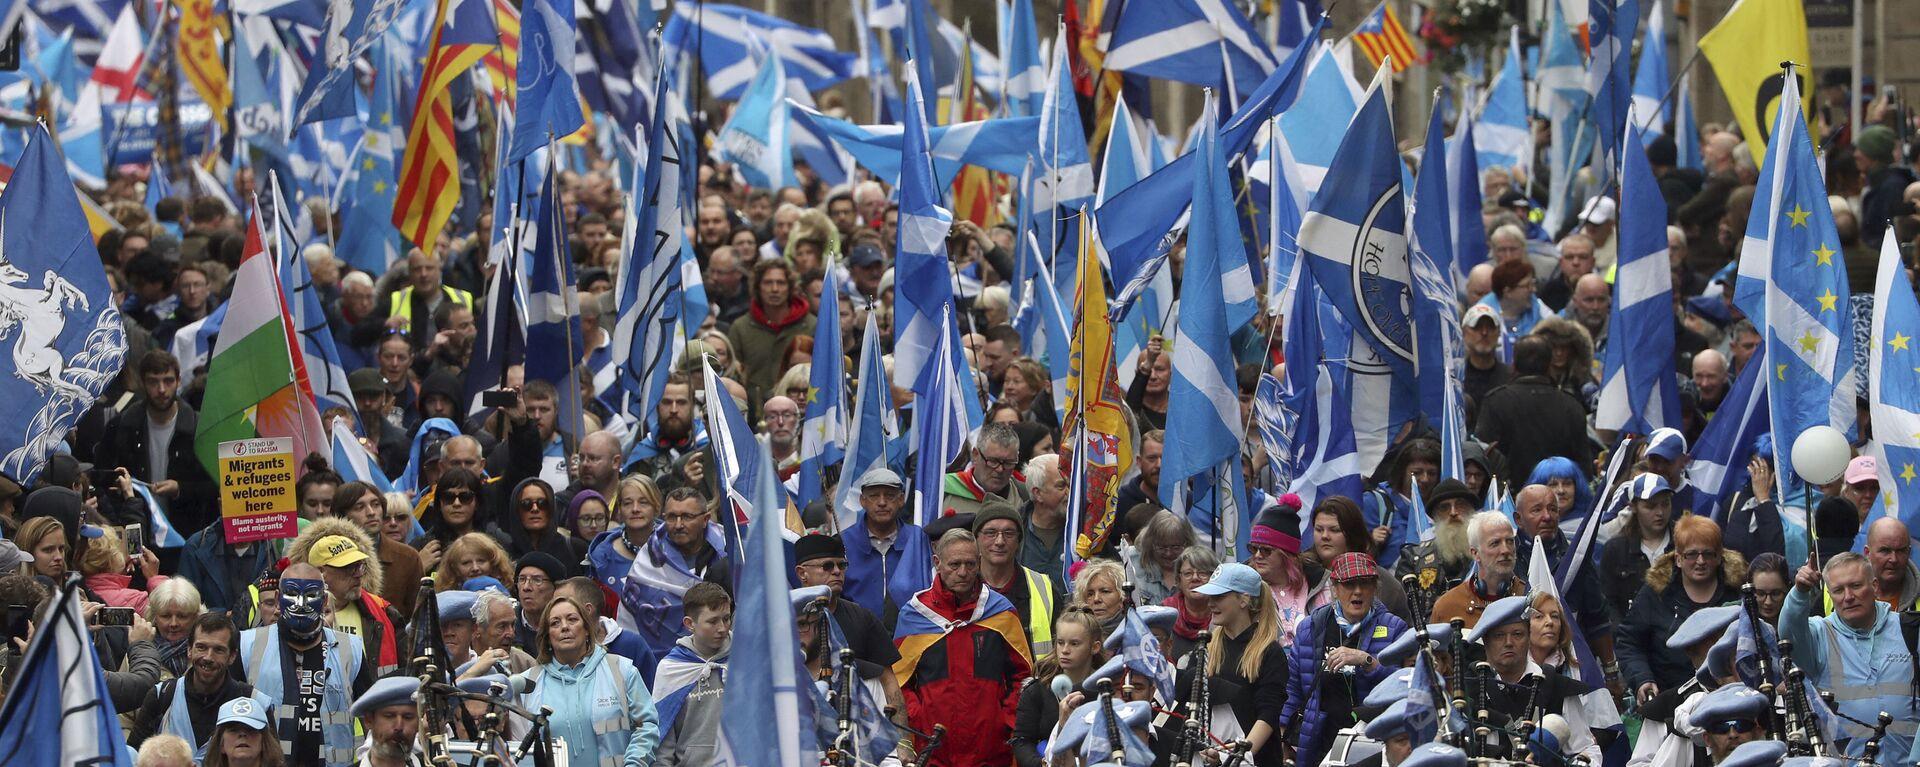 Scottish independence supporters march through Edinburgh, Scotland, Saturday Oct. 5, 2019. - Sputnik International, 1920, 03.02.2021